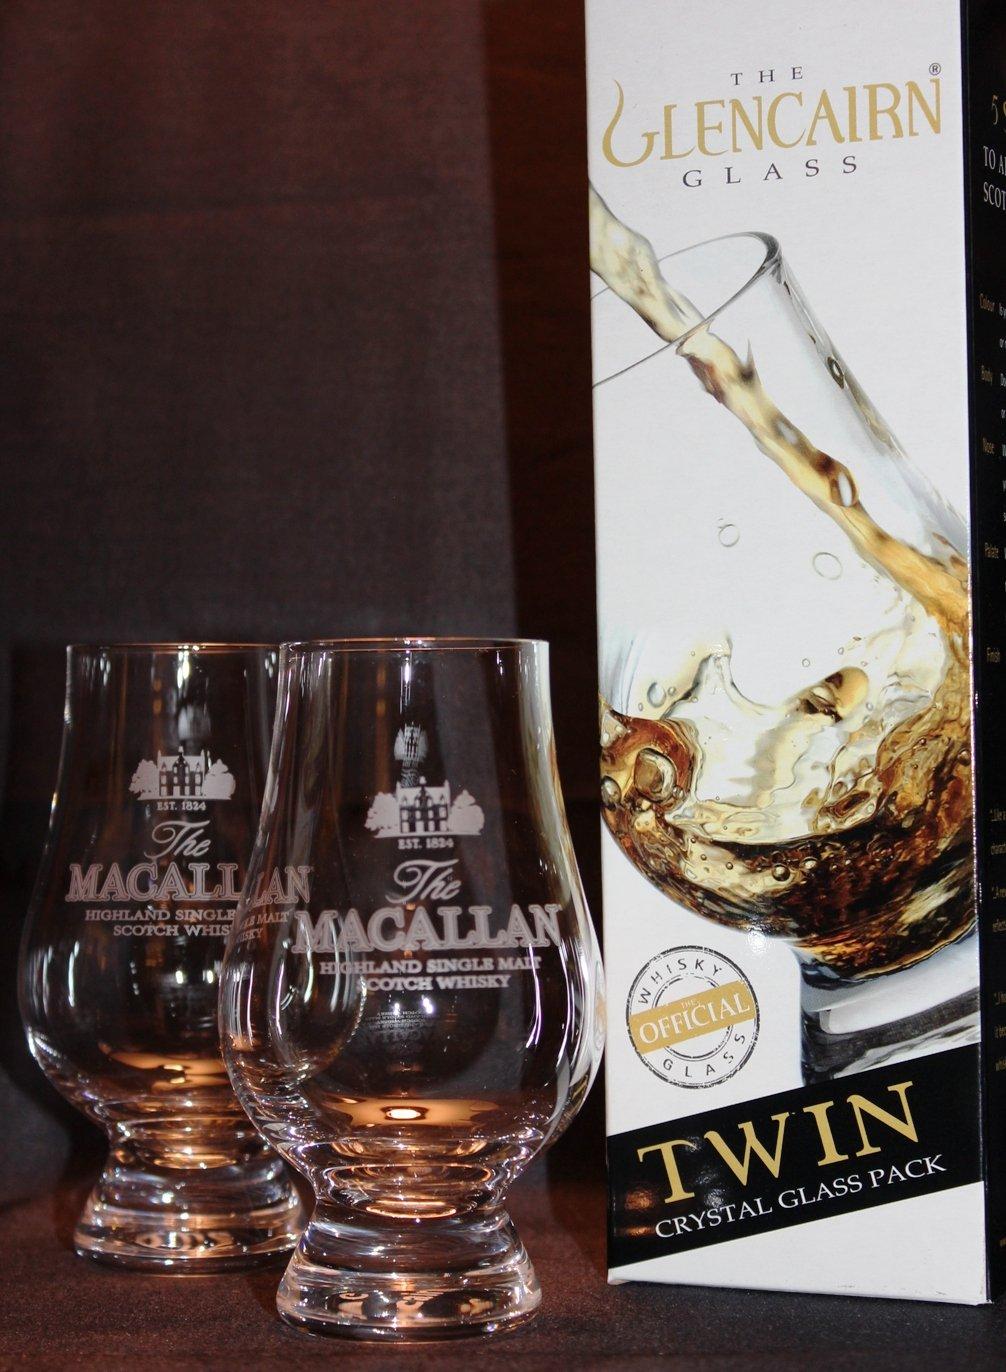 MACALLAN TWIN PACK GLENCAIRN SCOTCH MALT WHISKY TASTING GLASSES